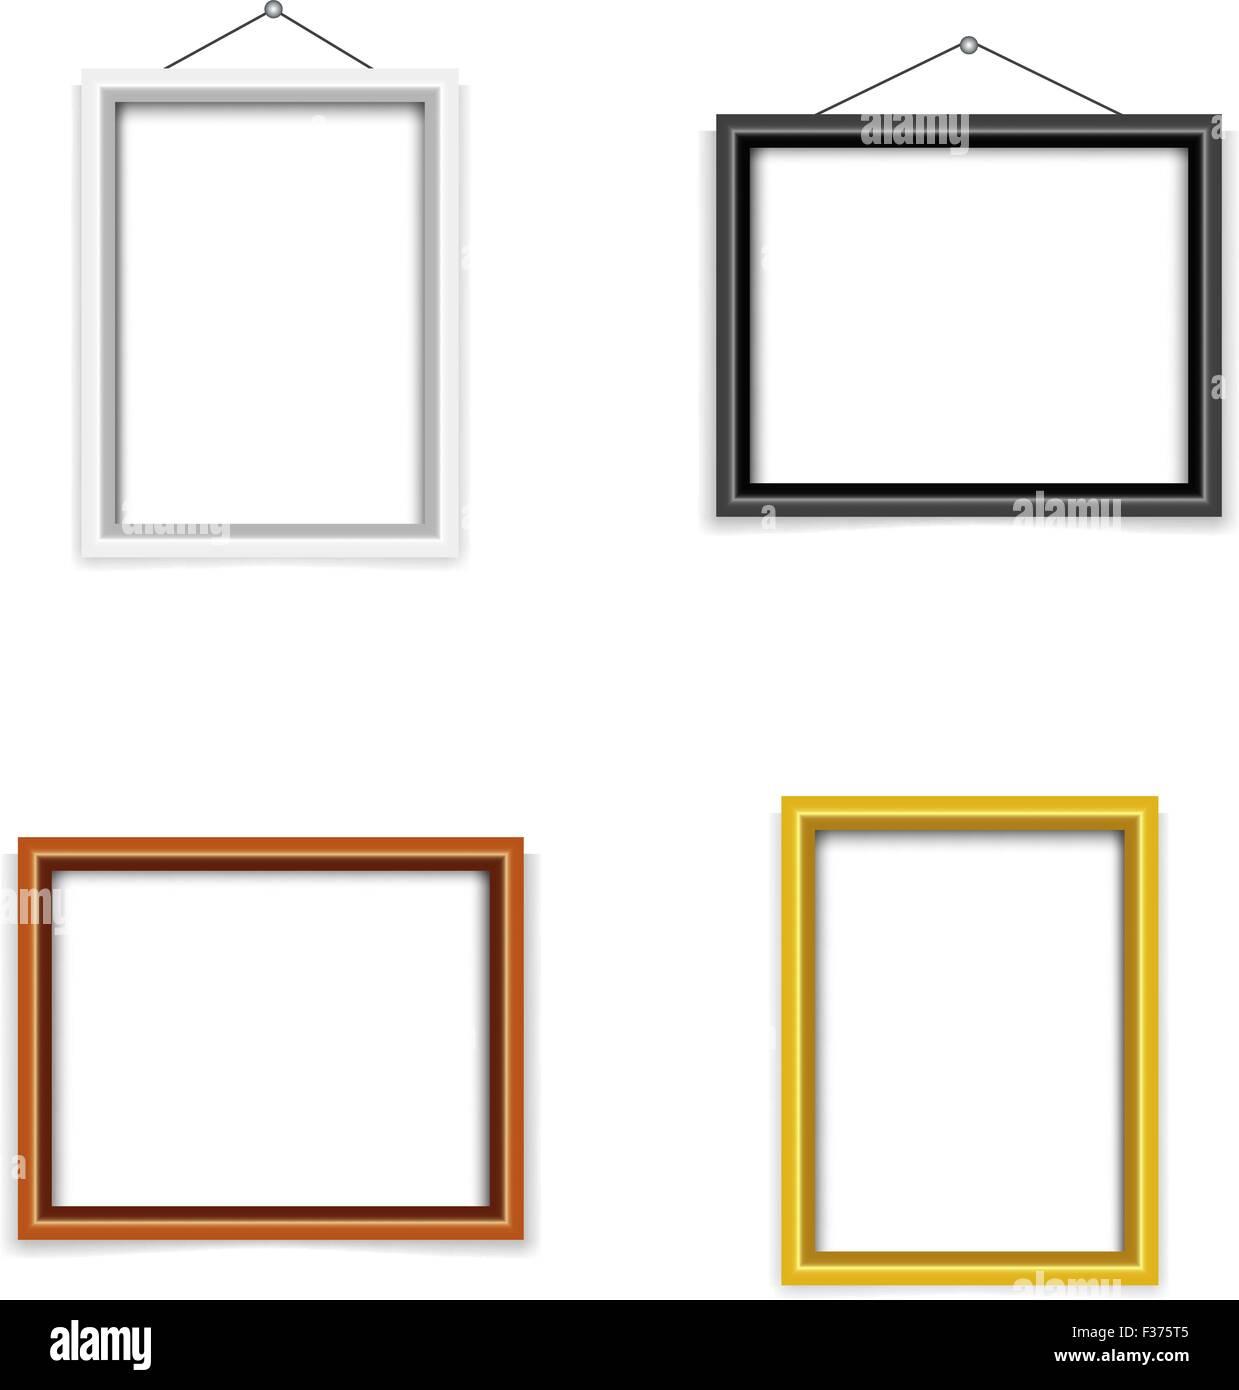 blank photo frame template set Stock Vector Art & Illustration ...